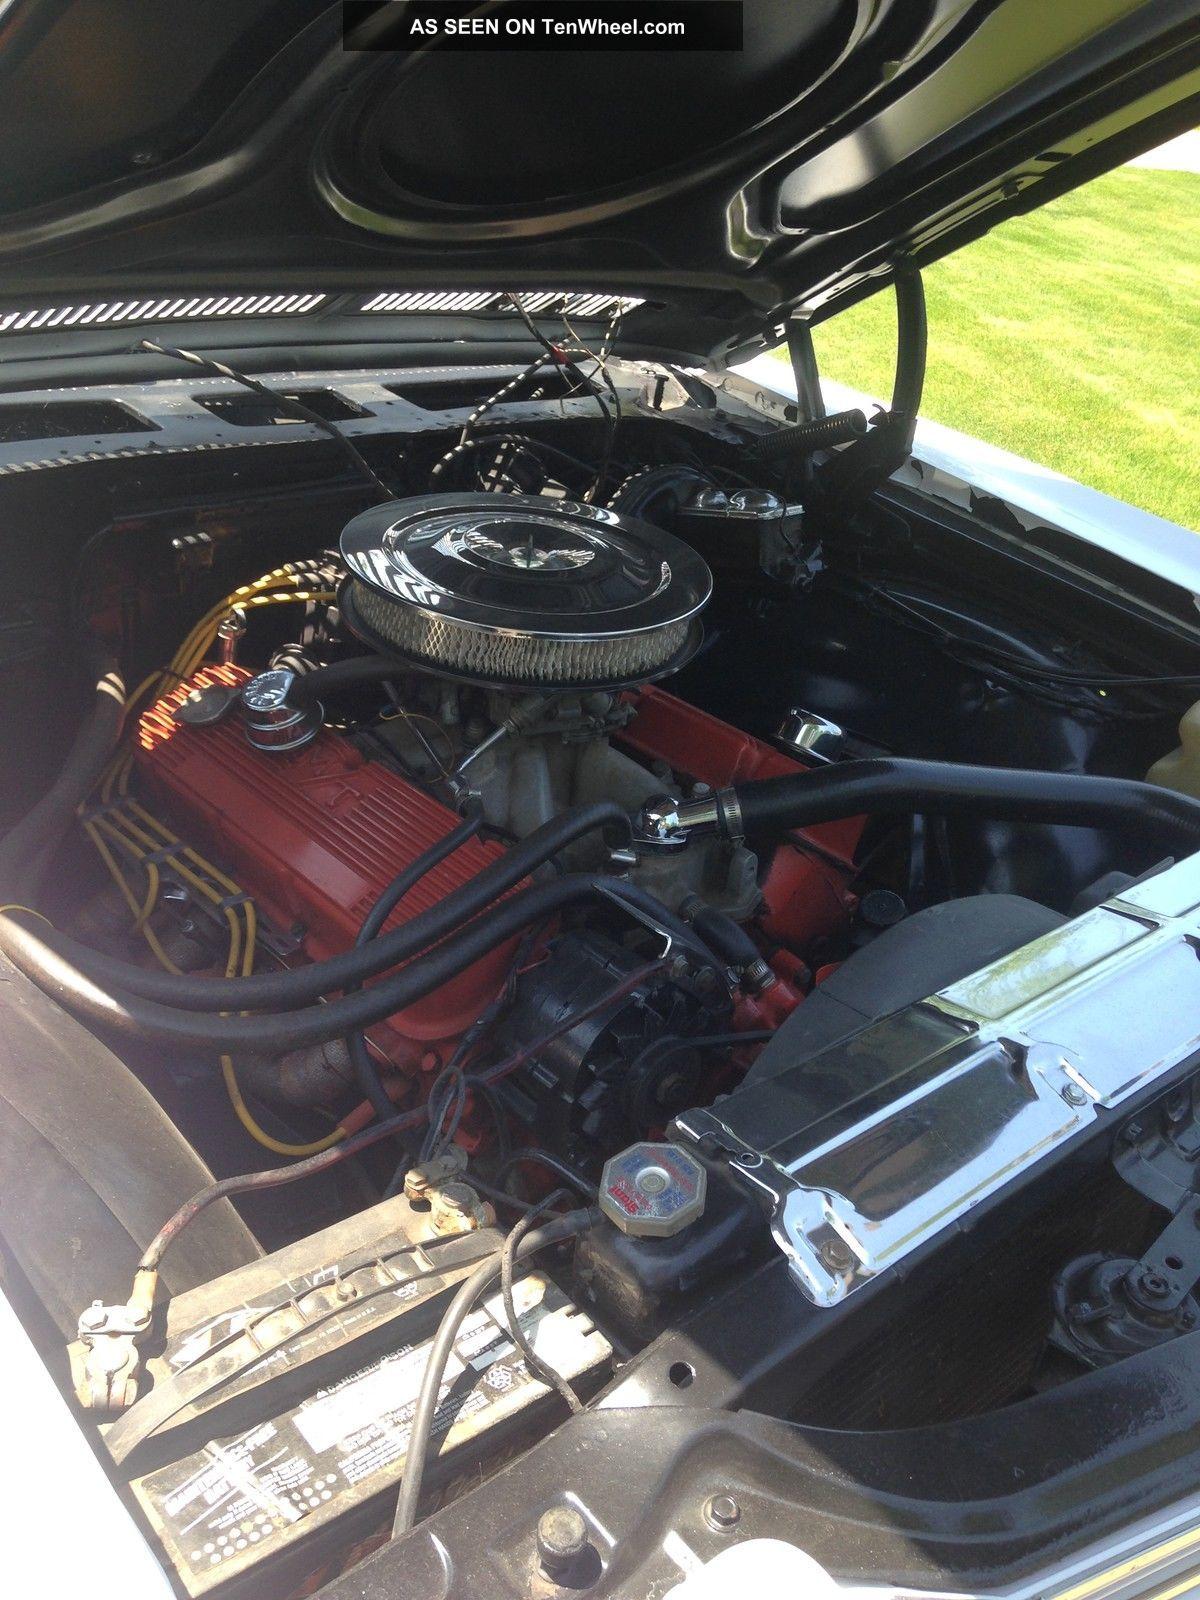 Dodge Charger All Wheel Drive >> 1970 Chevy El Camino, 402 Big Block